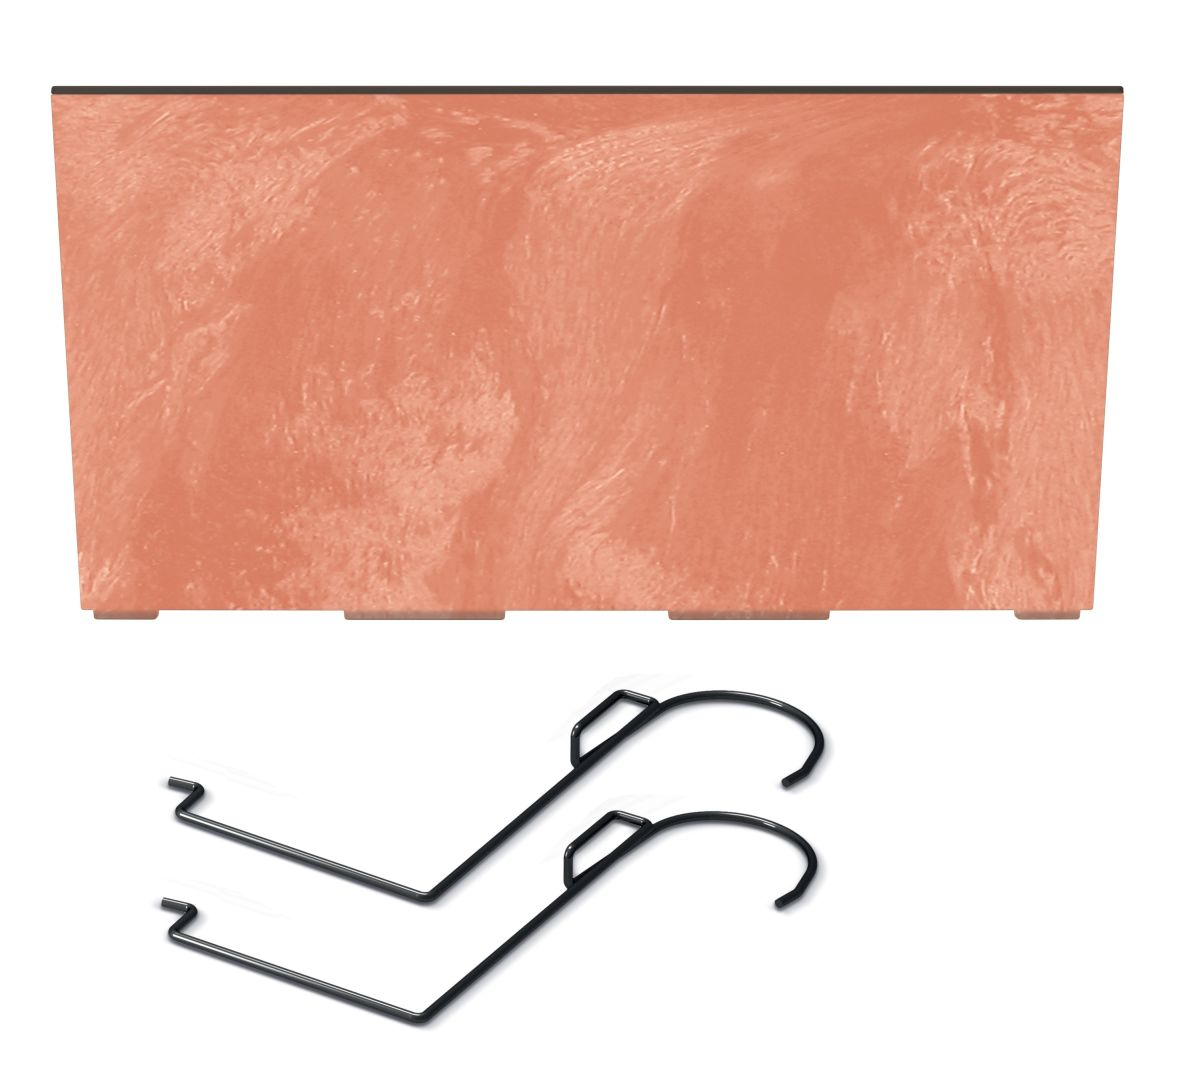 PROSPERPLAST Truhlík s háky URBI CASE BETON EFFECT W terakota 58cm